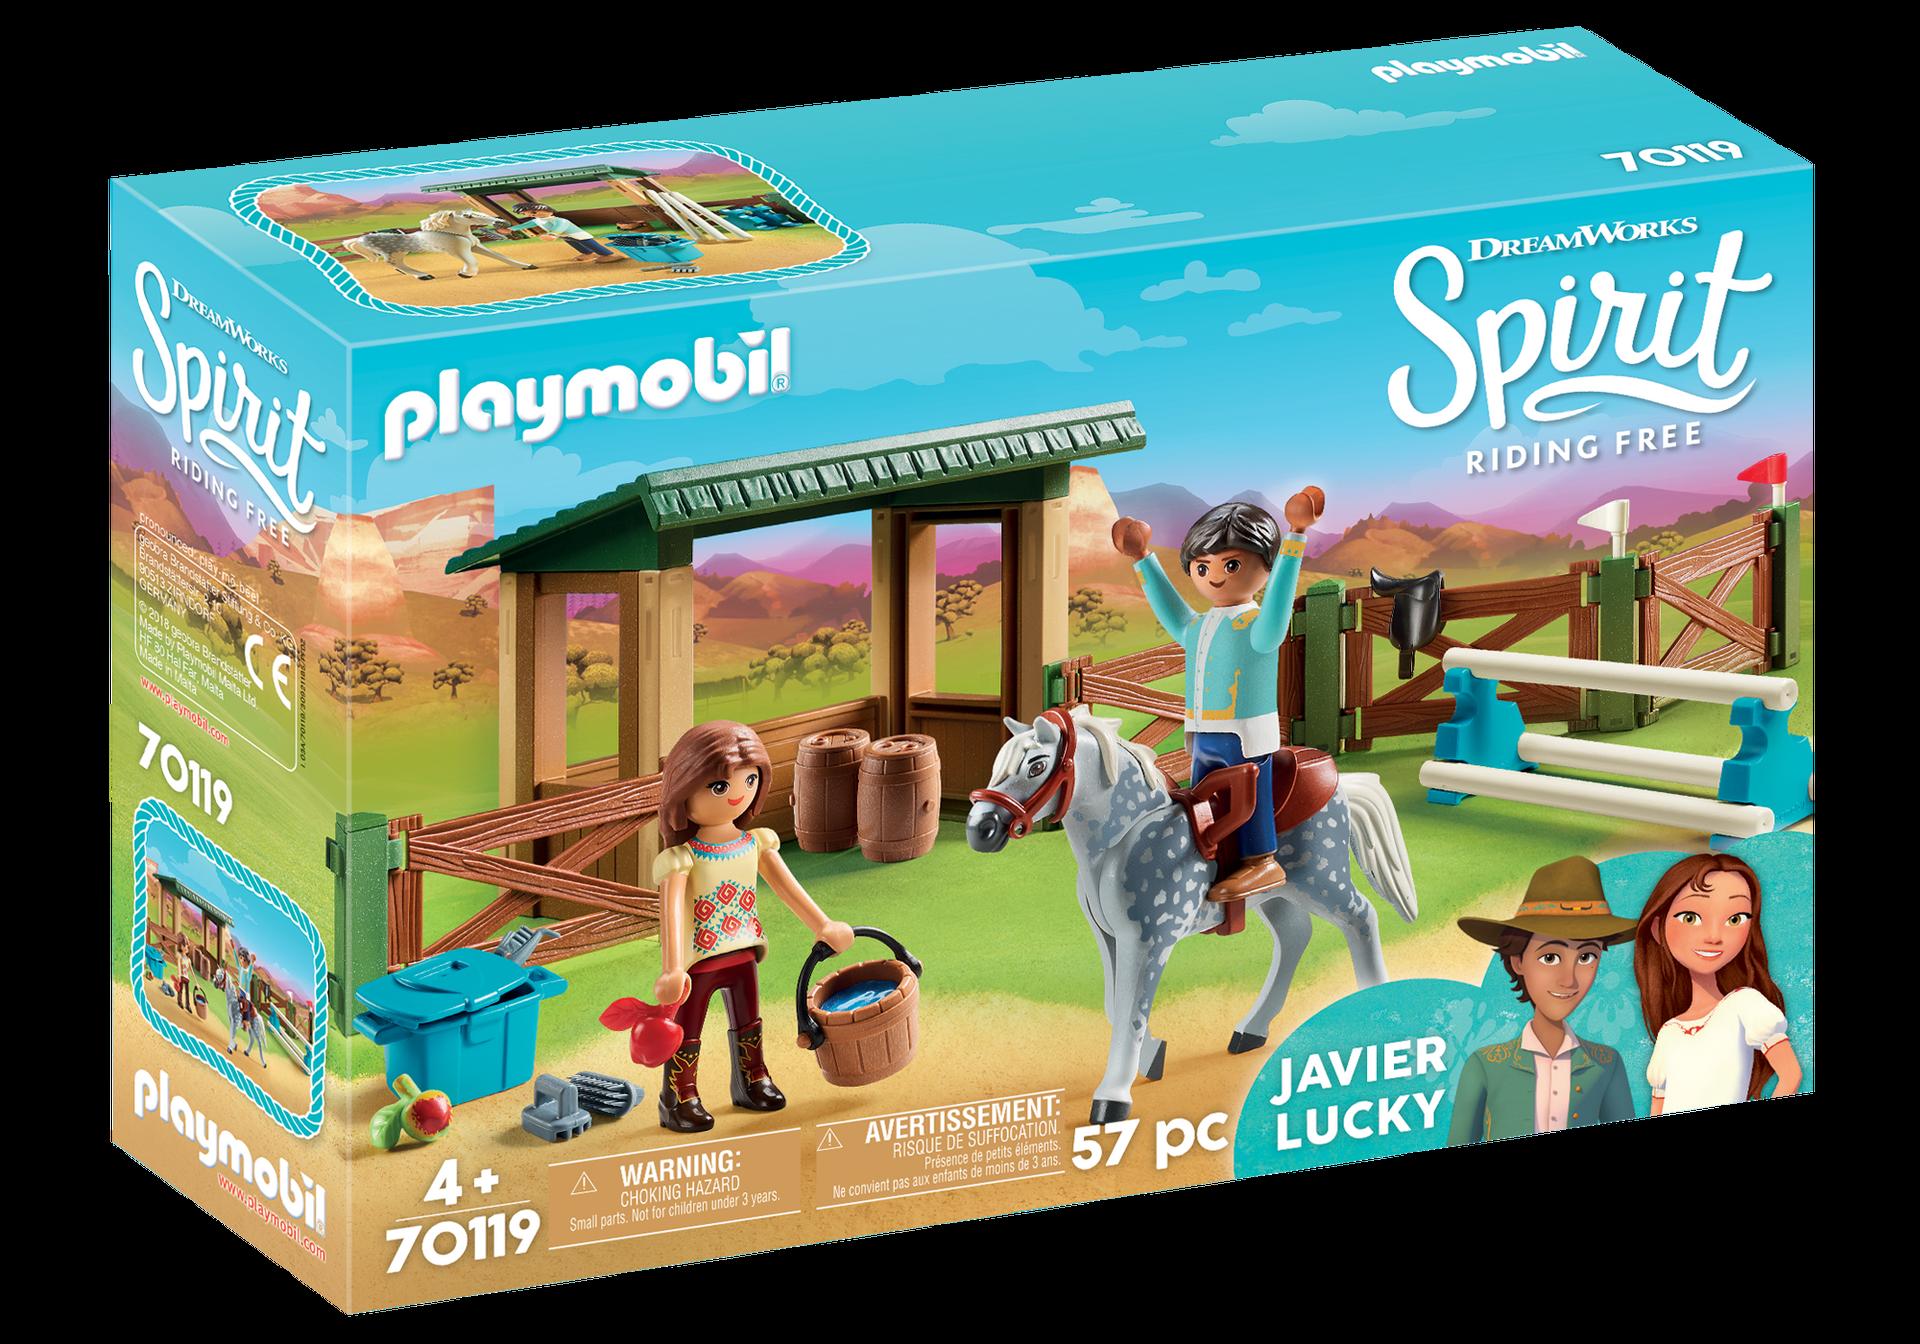 Playmobil - Riding Arena with Lucky & Javier (70119)